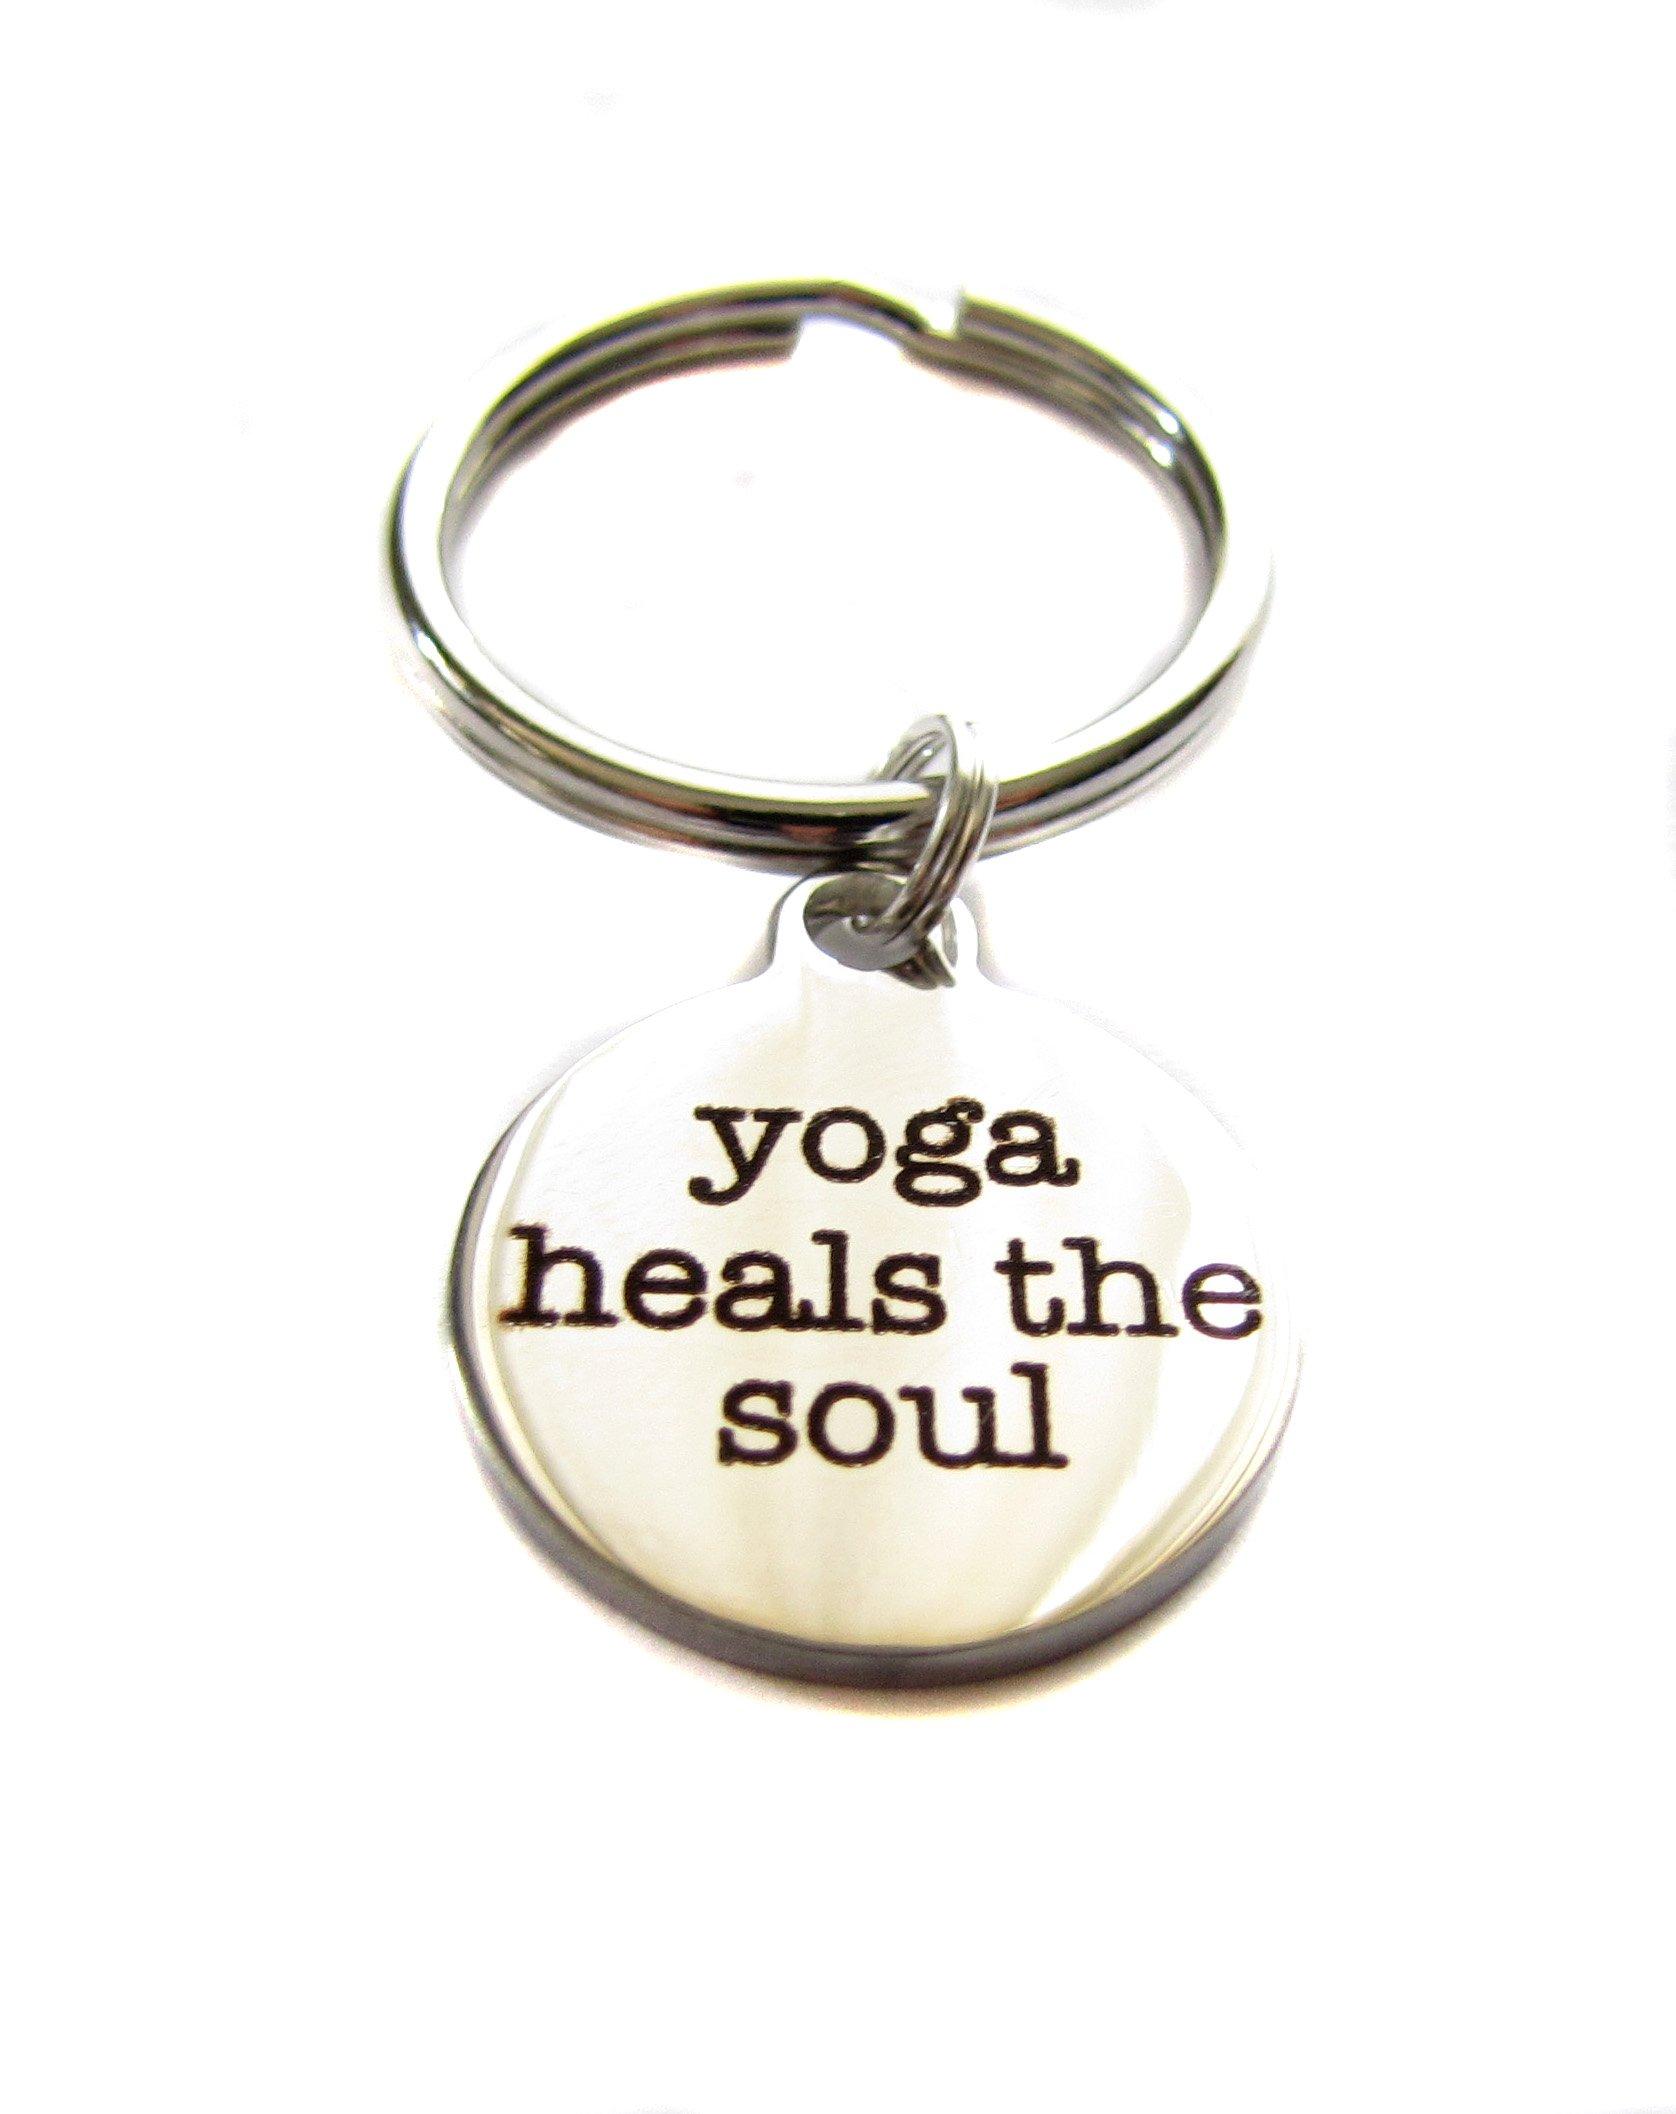 Stainless Steel ''Yoga Heals The Soul'' Charm Keychain, Bag Charm, Yoga Bag Charm Gift